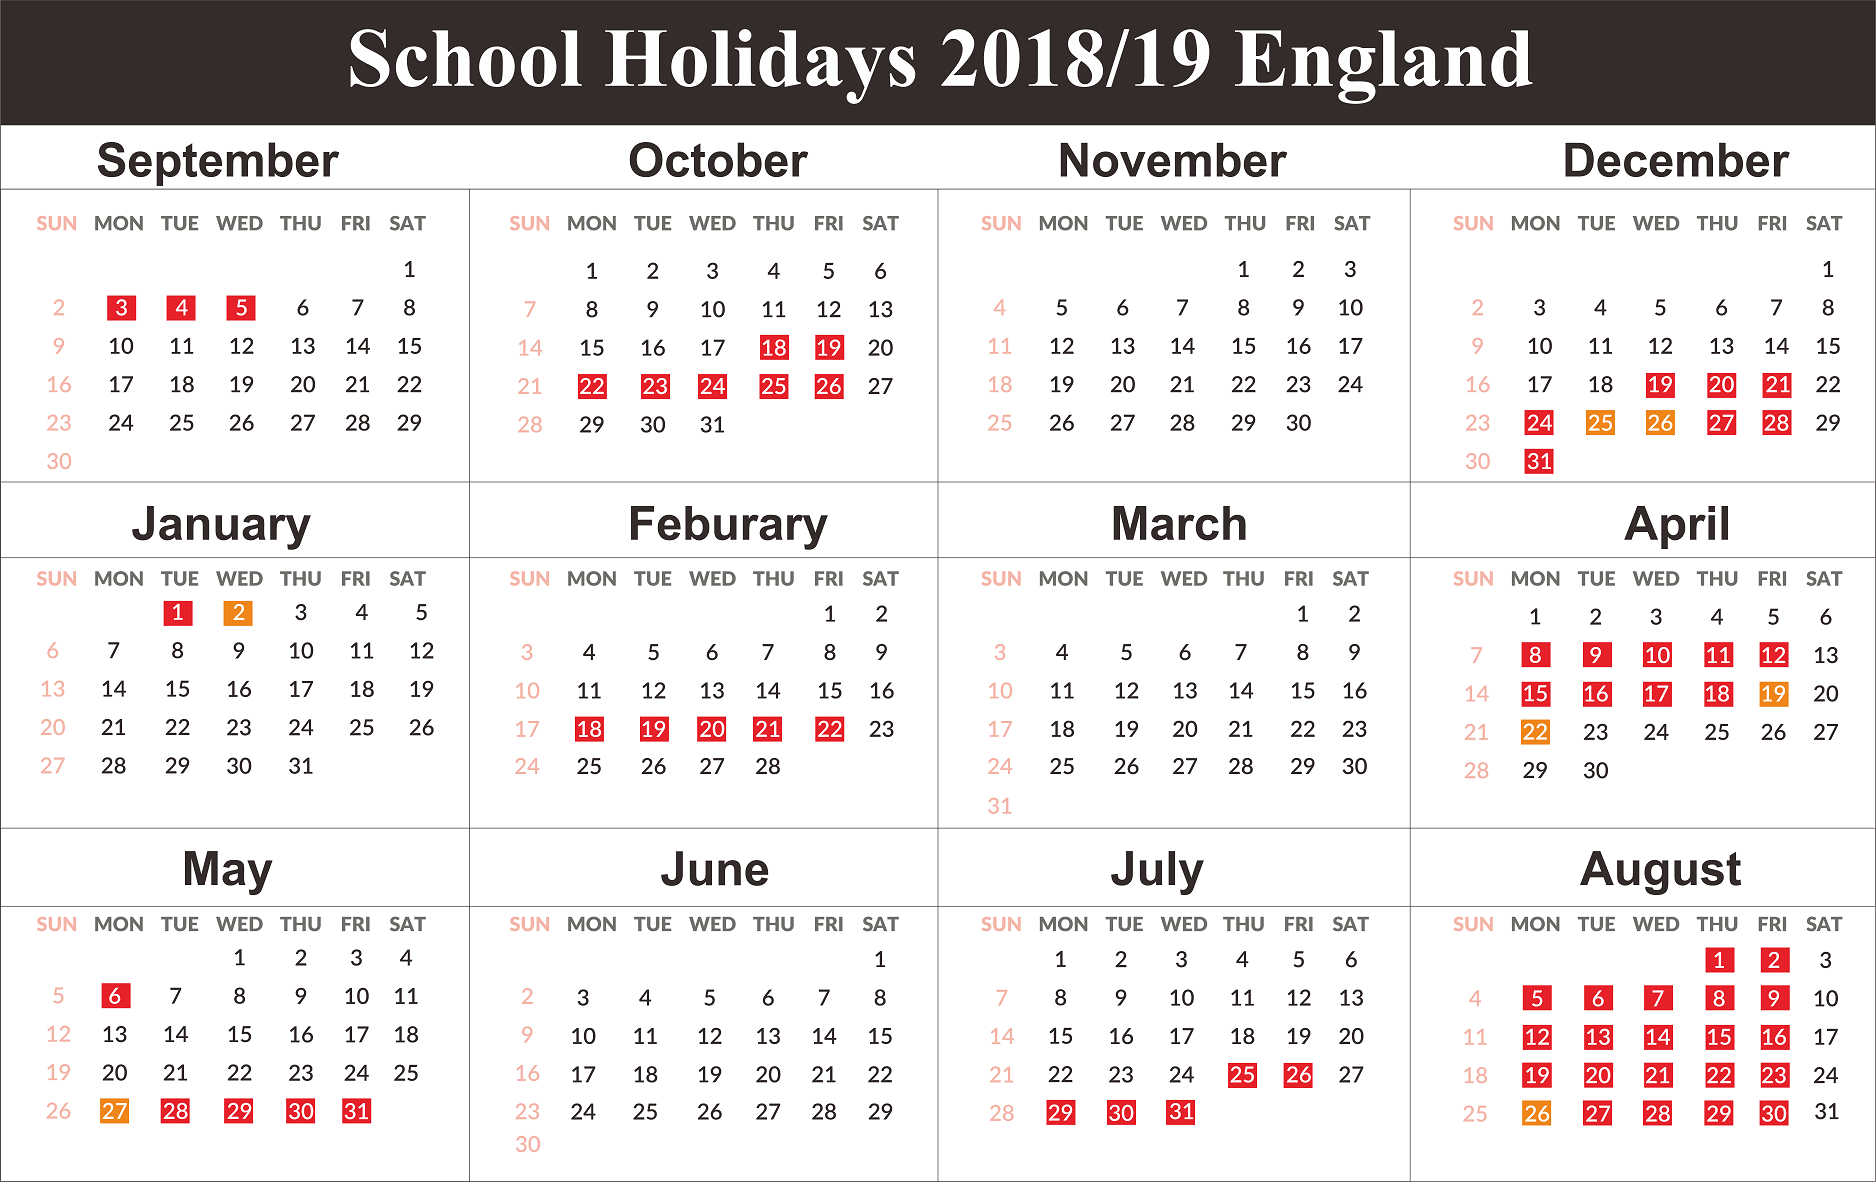 England School Holidays 2019 Calendar